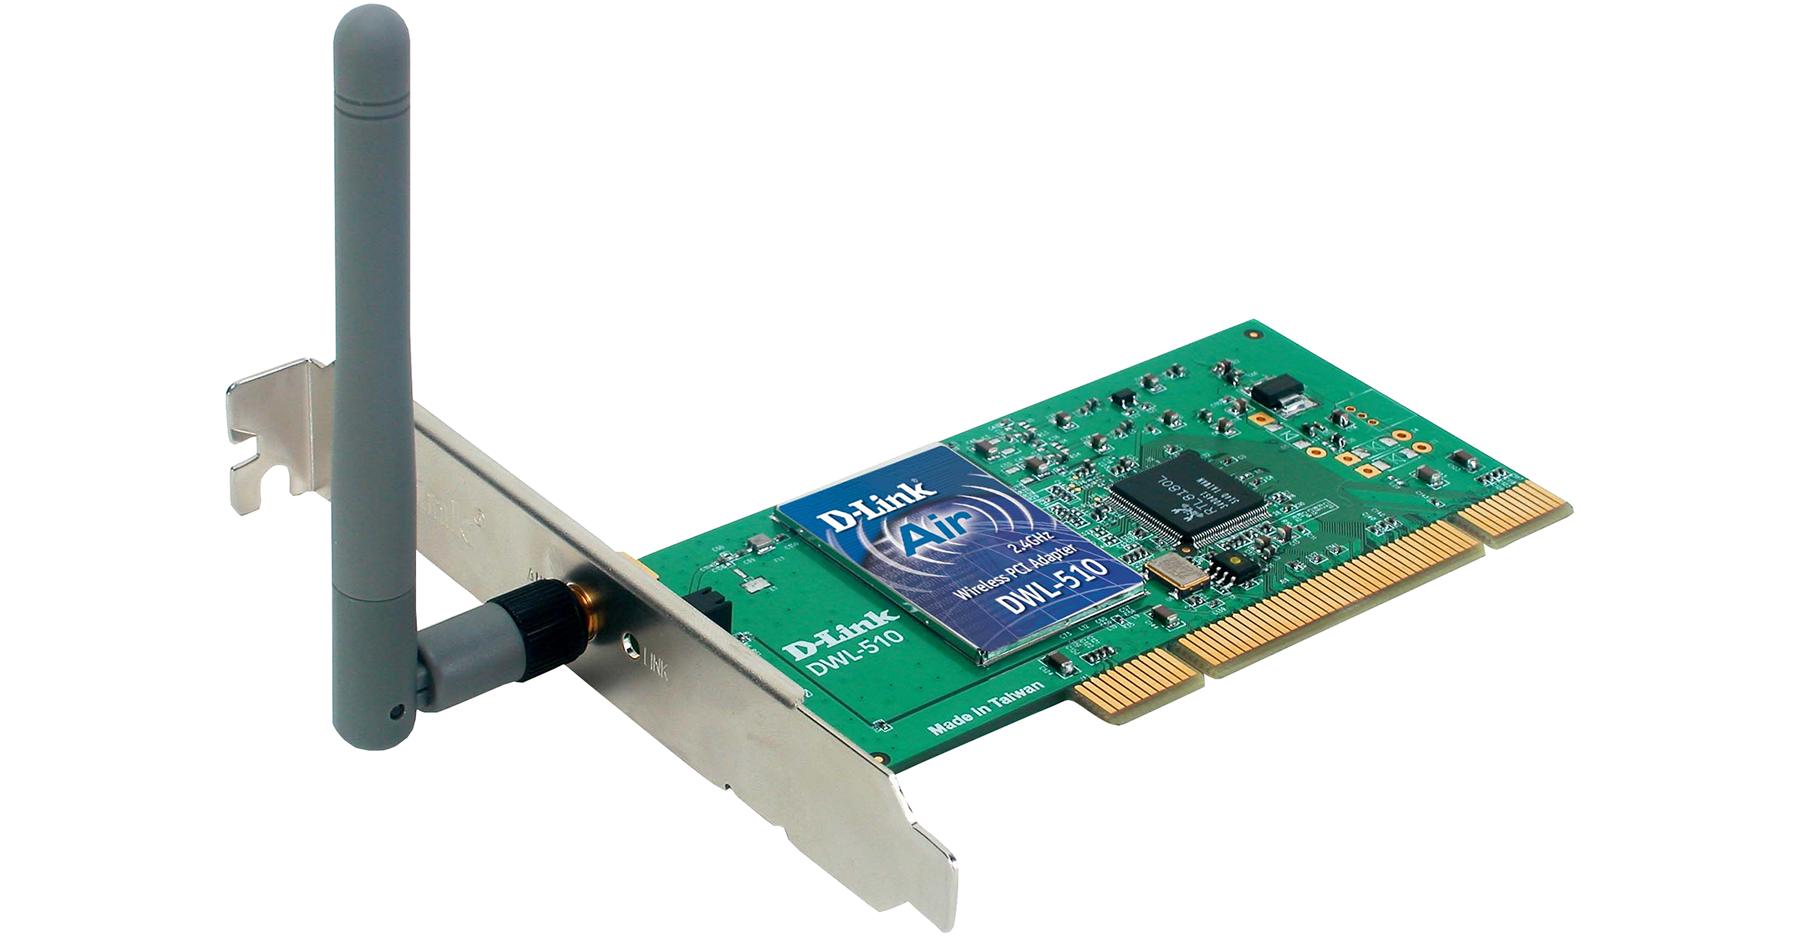 Dwl-g510 54mbps wireless-g lan pci card | d-link uk.